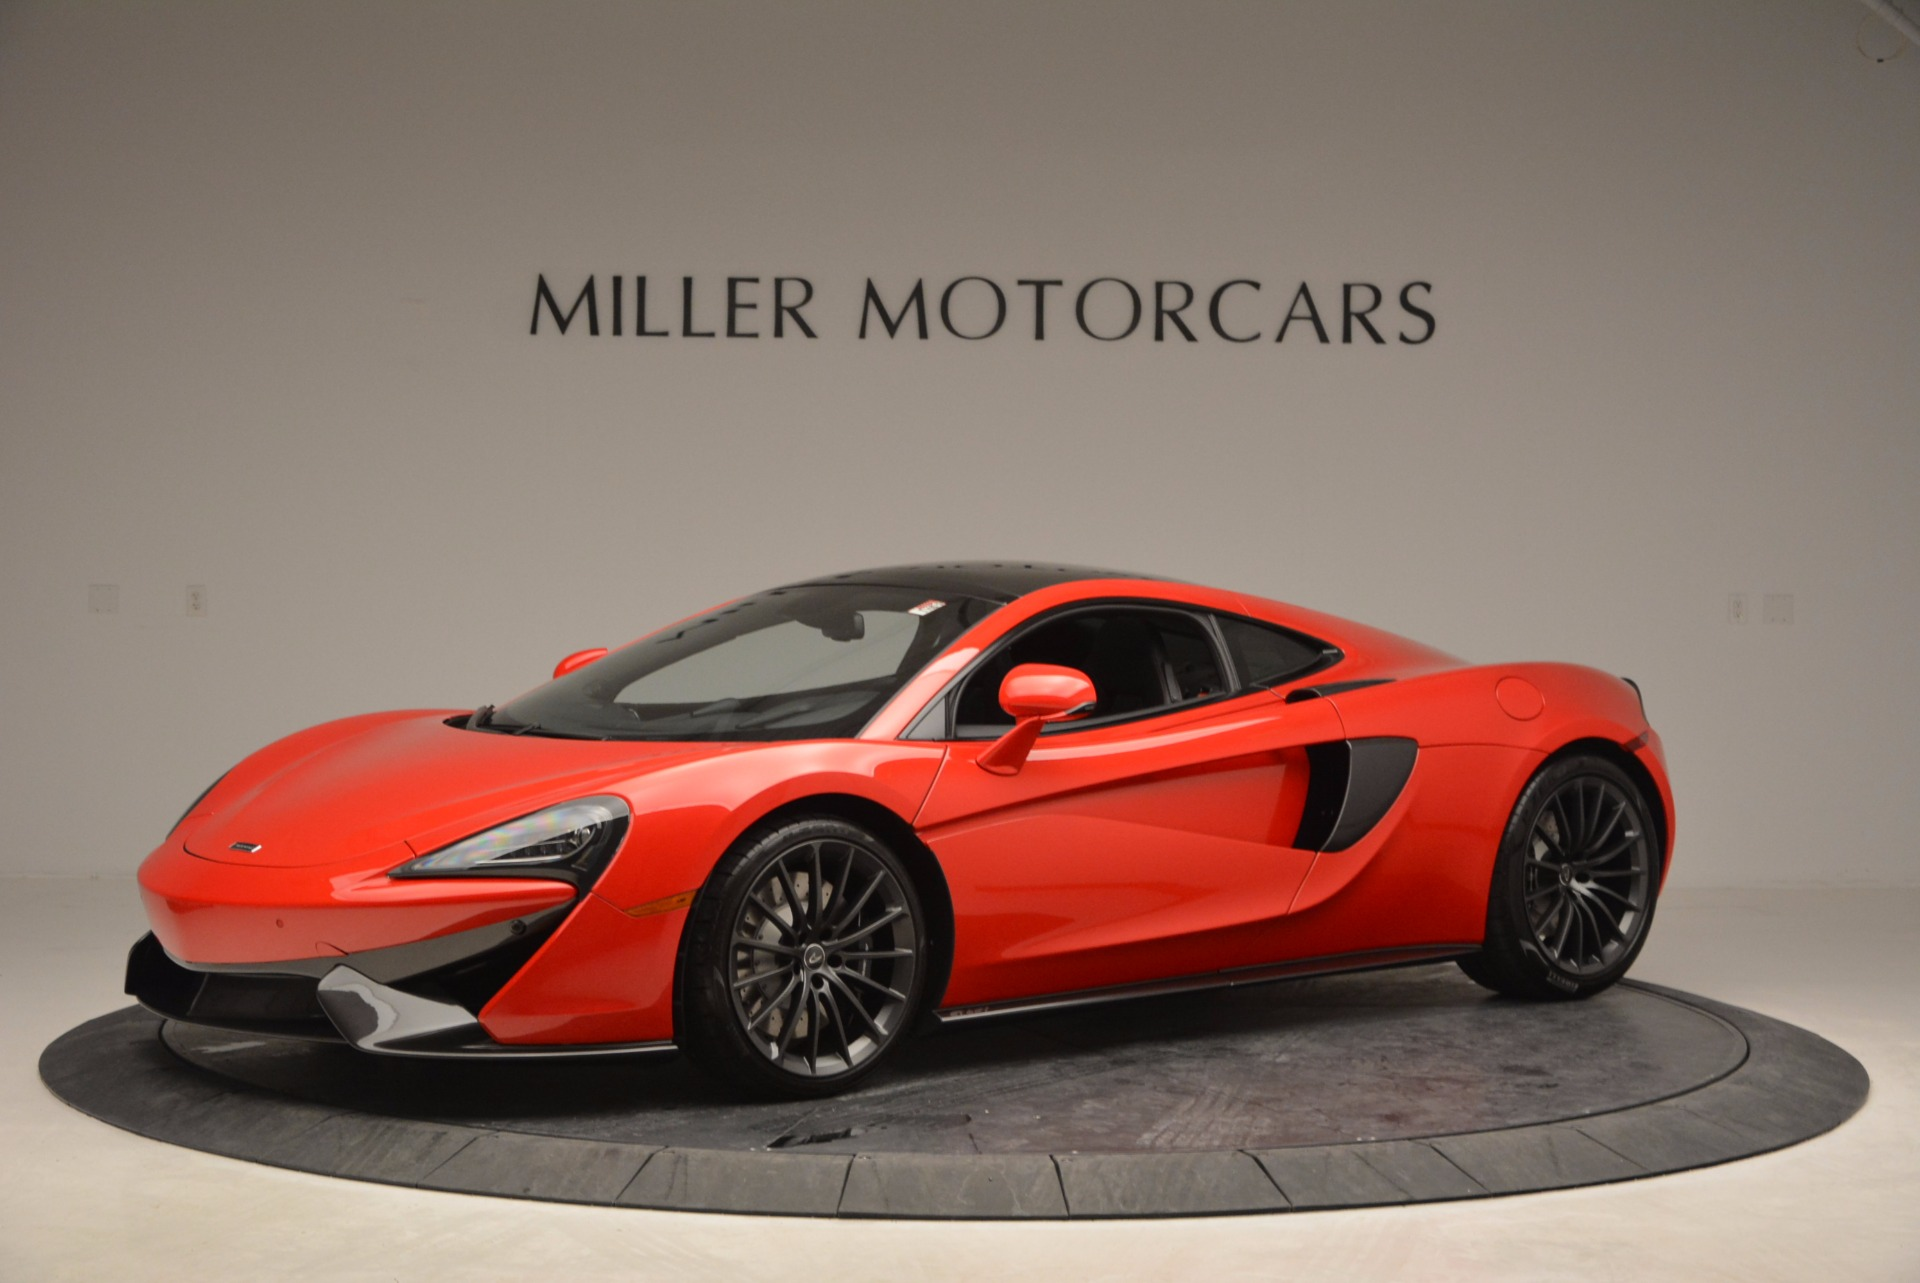 Used 2017 McLaren 570GT Coupe for sale Sold at Alfa Romeo of Westport in Westport CT 06880 1